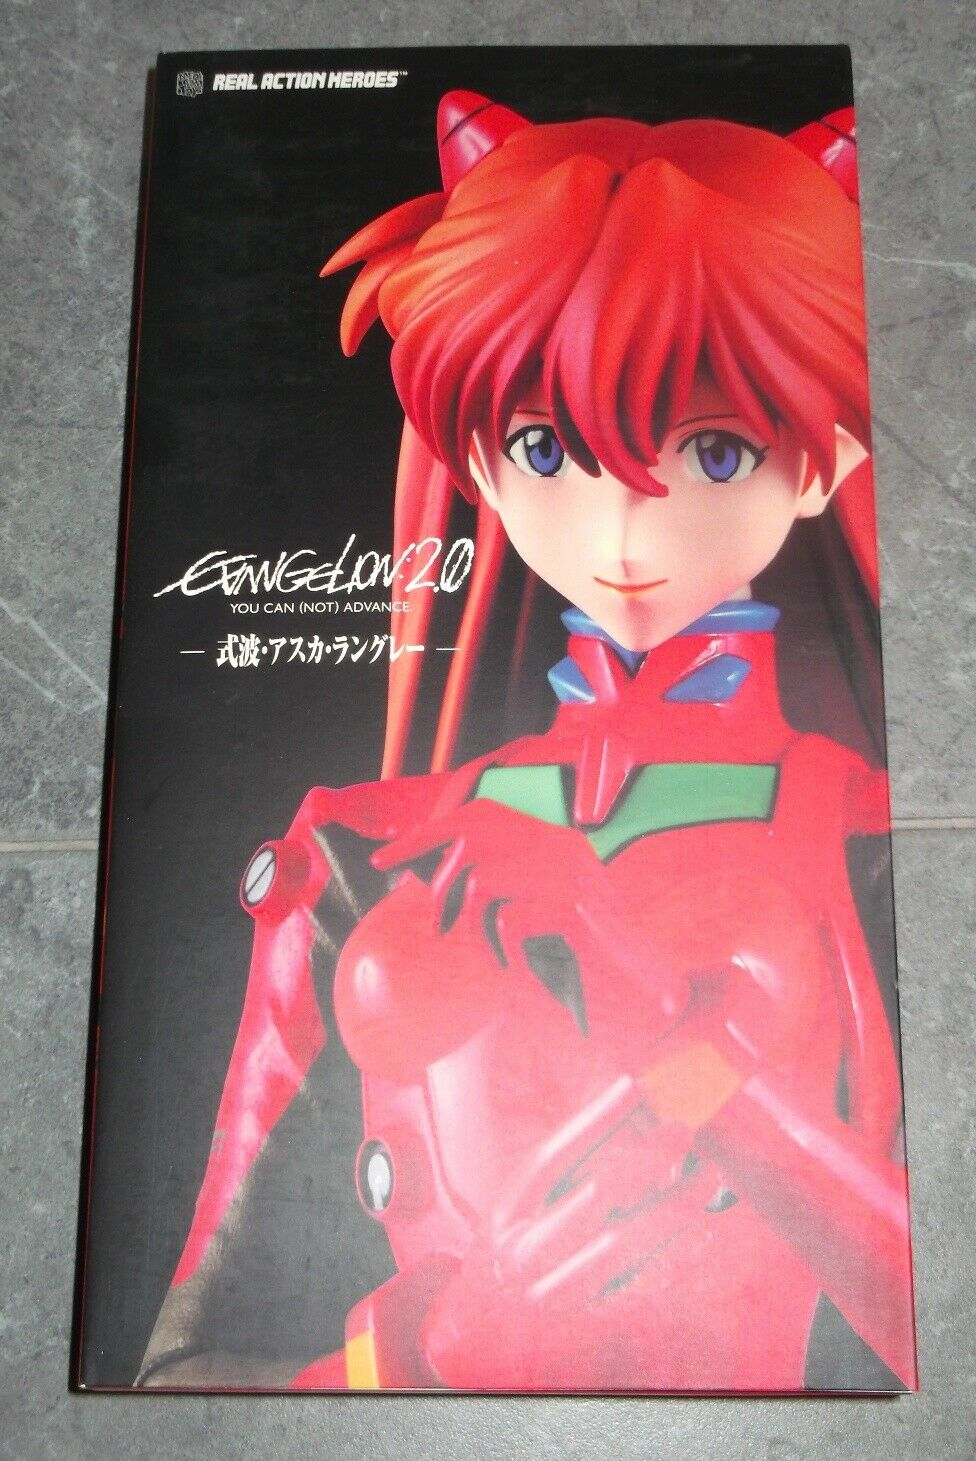 Medicom RAH ASUKA LANGLEY SHIKINAMI 1 6 Real Action Heroes Figure Evangelion 2.0